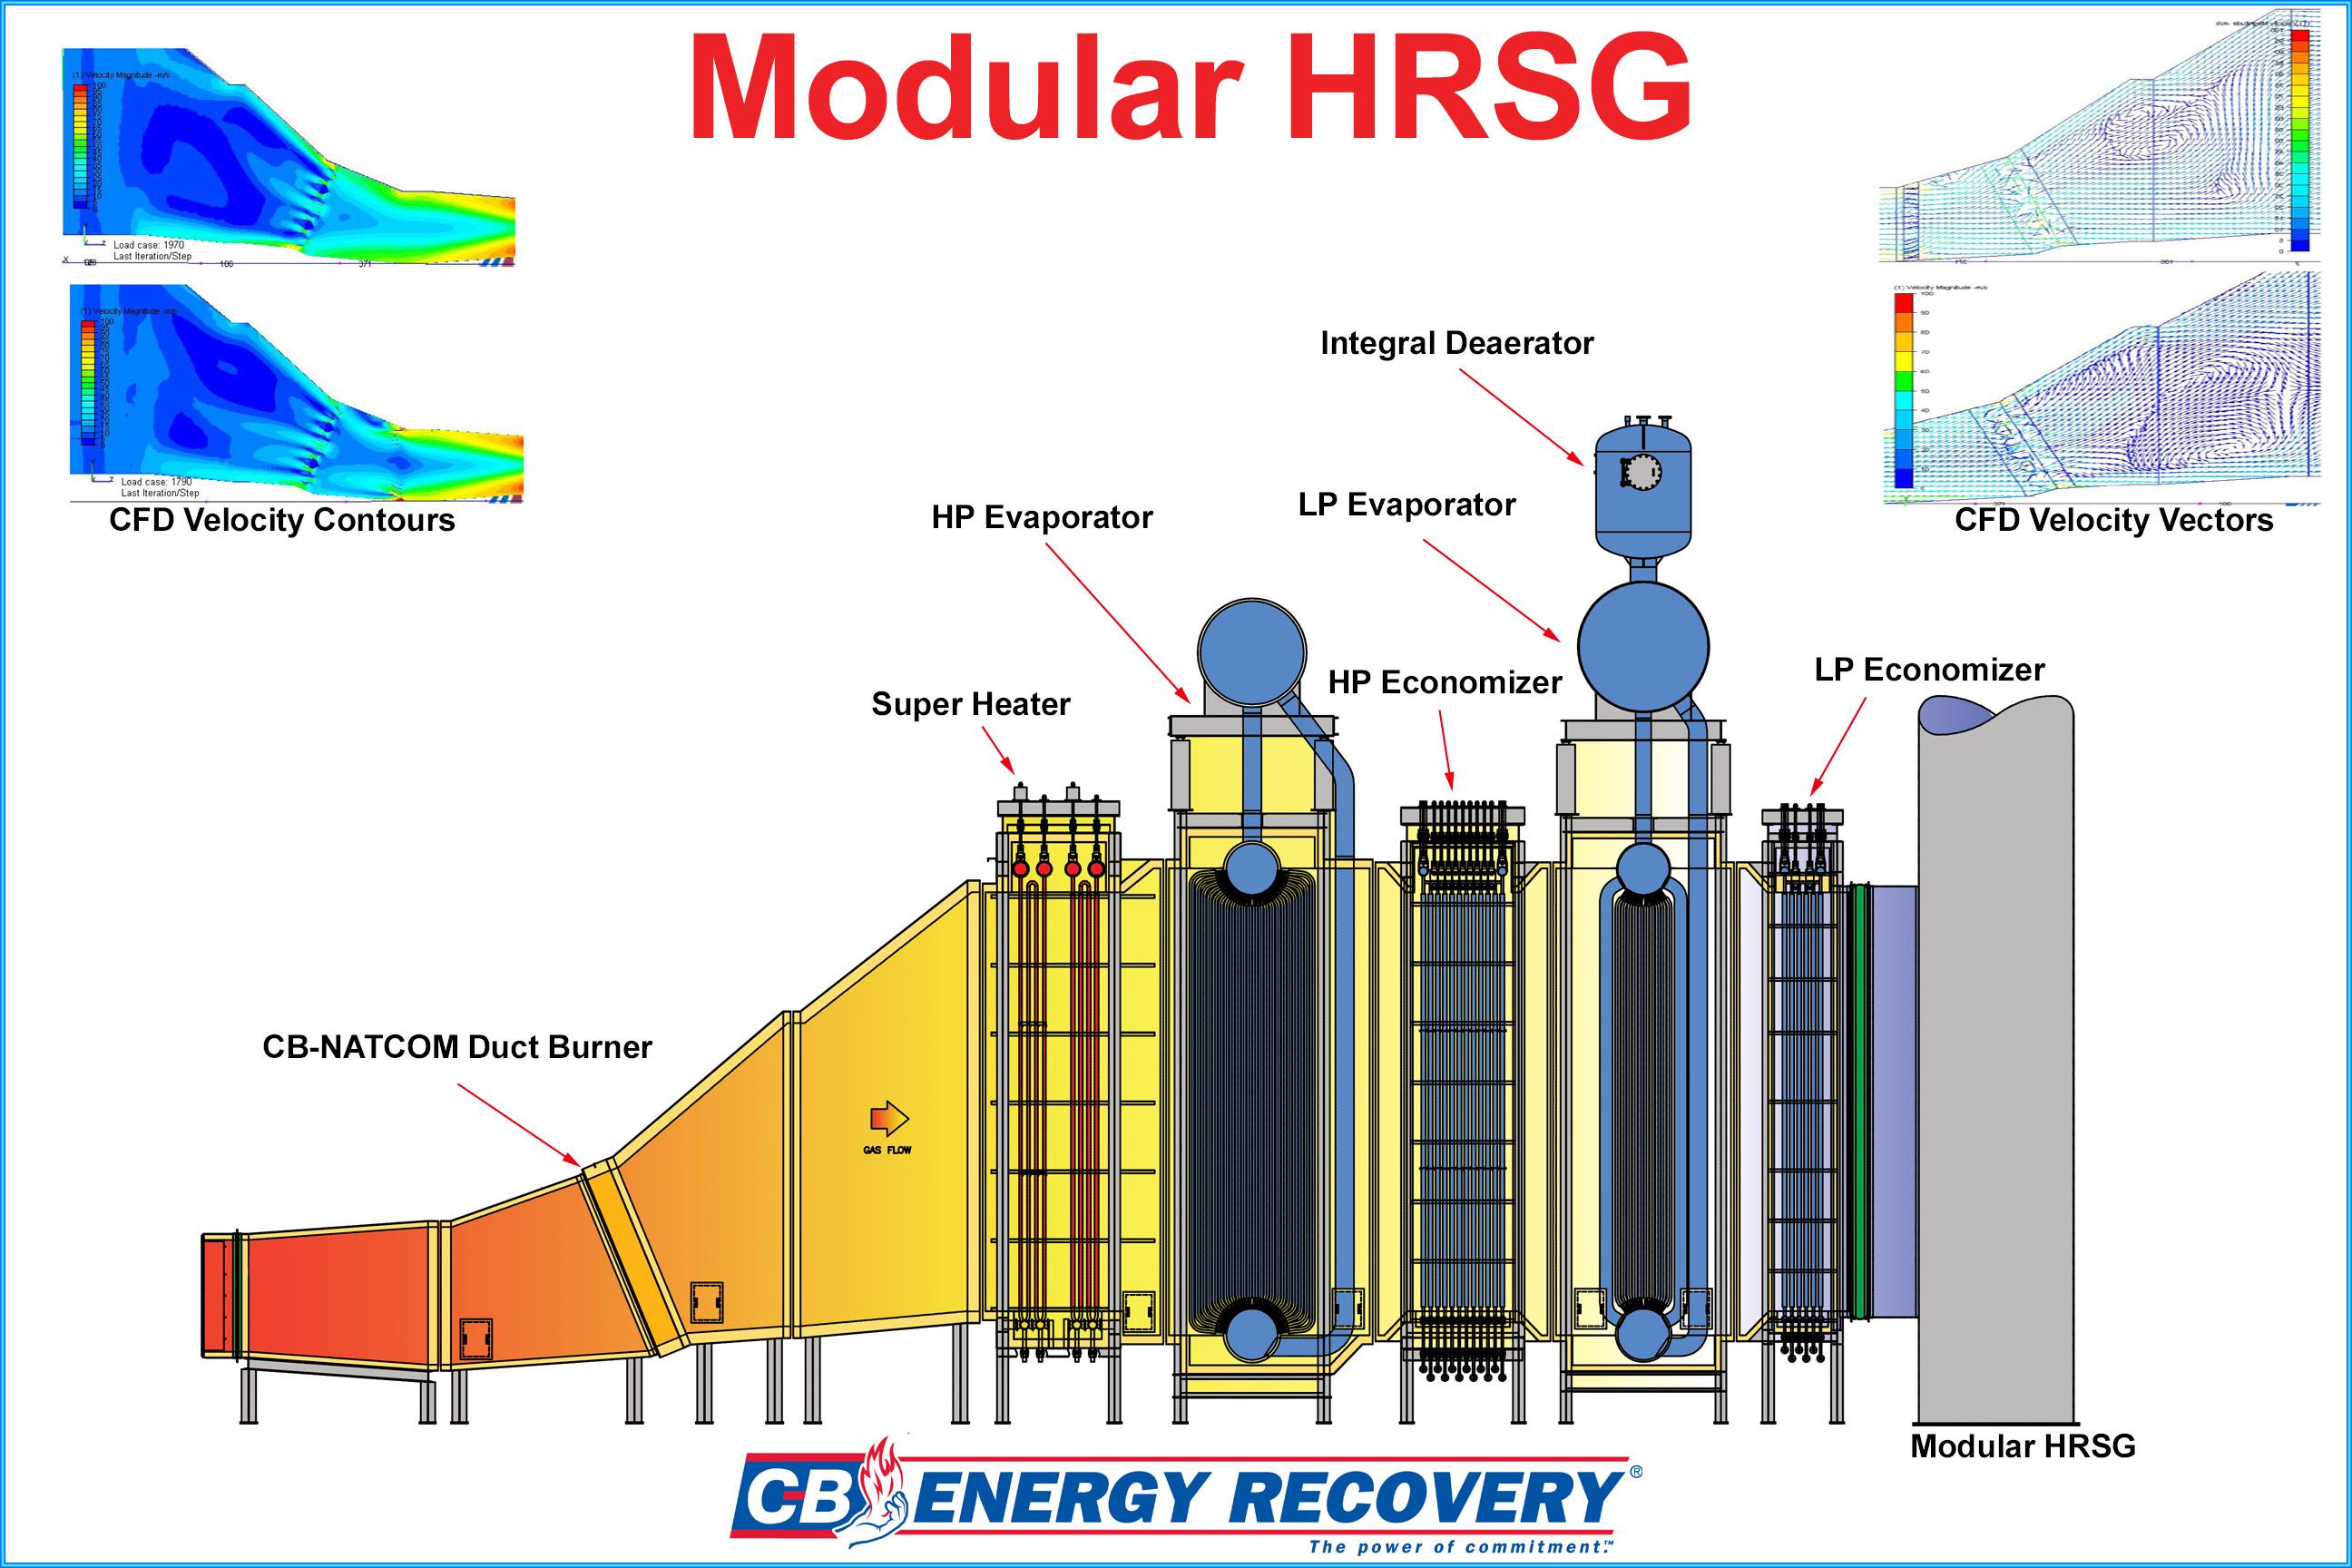 vapore-gvr-hrsg-ciclo-produzione-acciaieria-terni-ast-avvenia- terna-efficienza-energetica-co2-riduzione-emissioni-combustibili-fossili-CuE